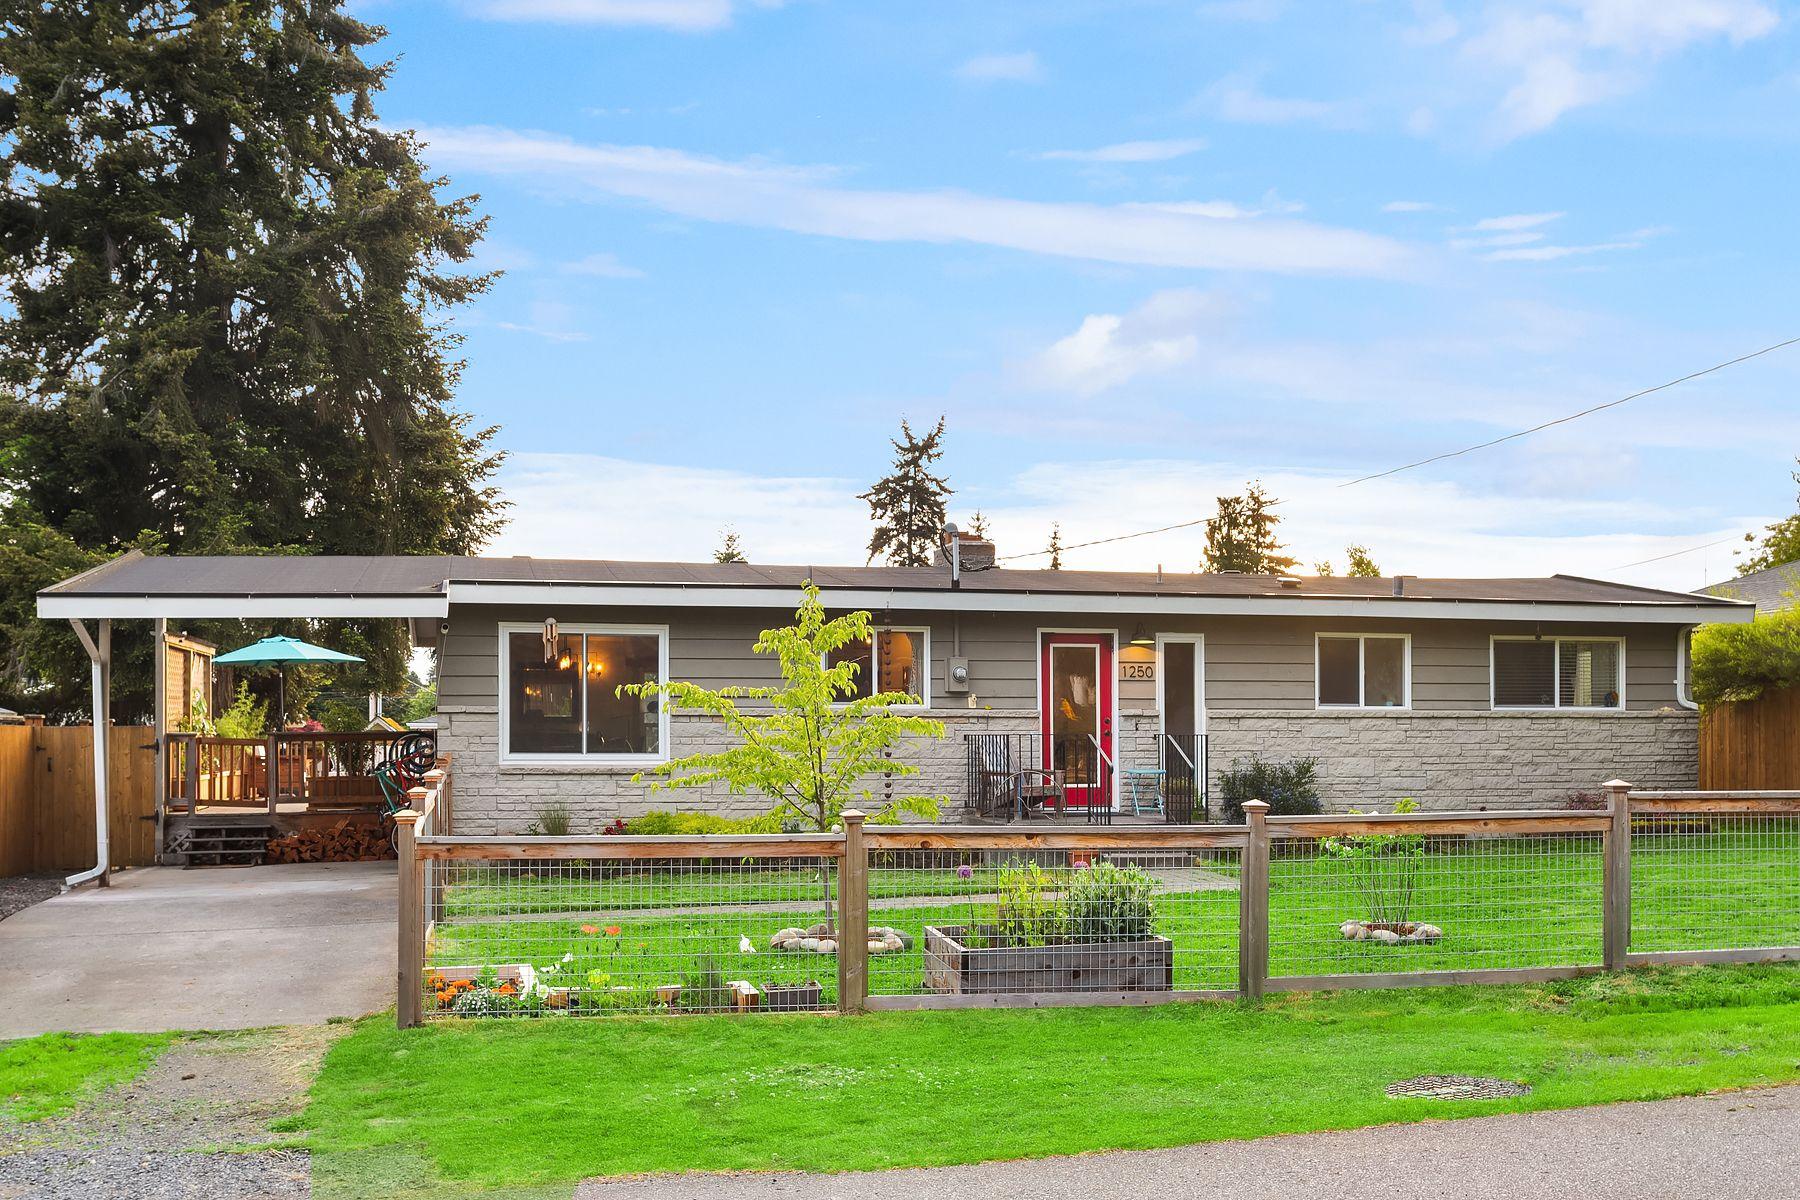 Single Family Homes for Sale at 1250 Coronado Place, Edmonds, WA 98020 Edmonds, Washington 98020 United States